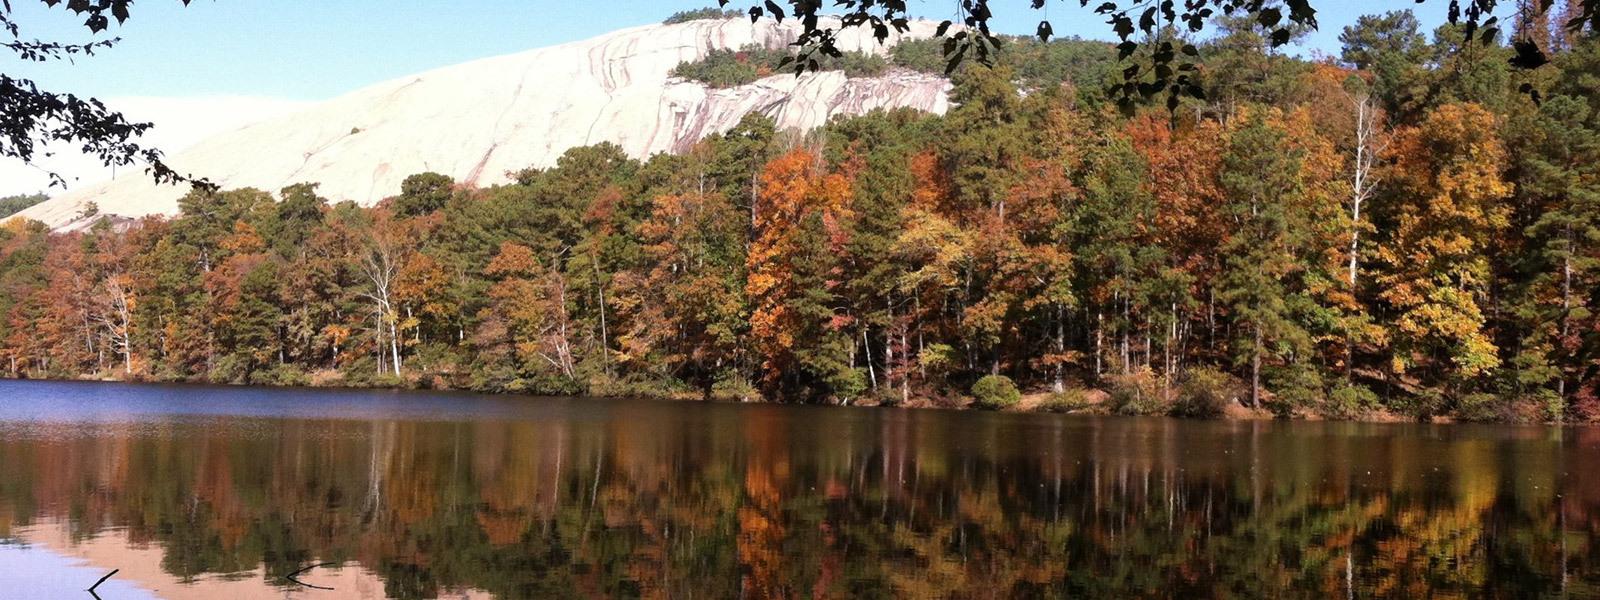 Lake Photo 1